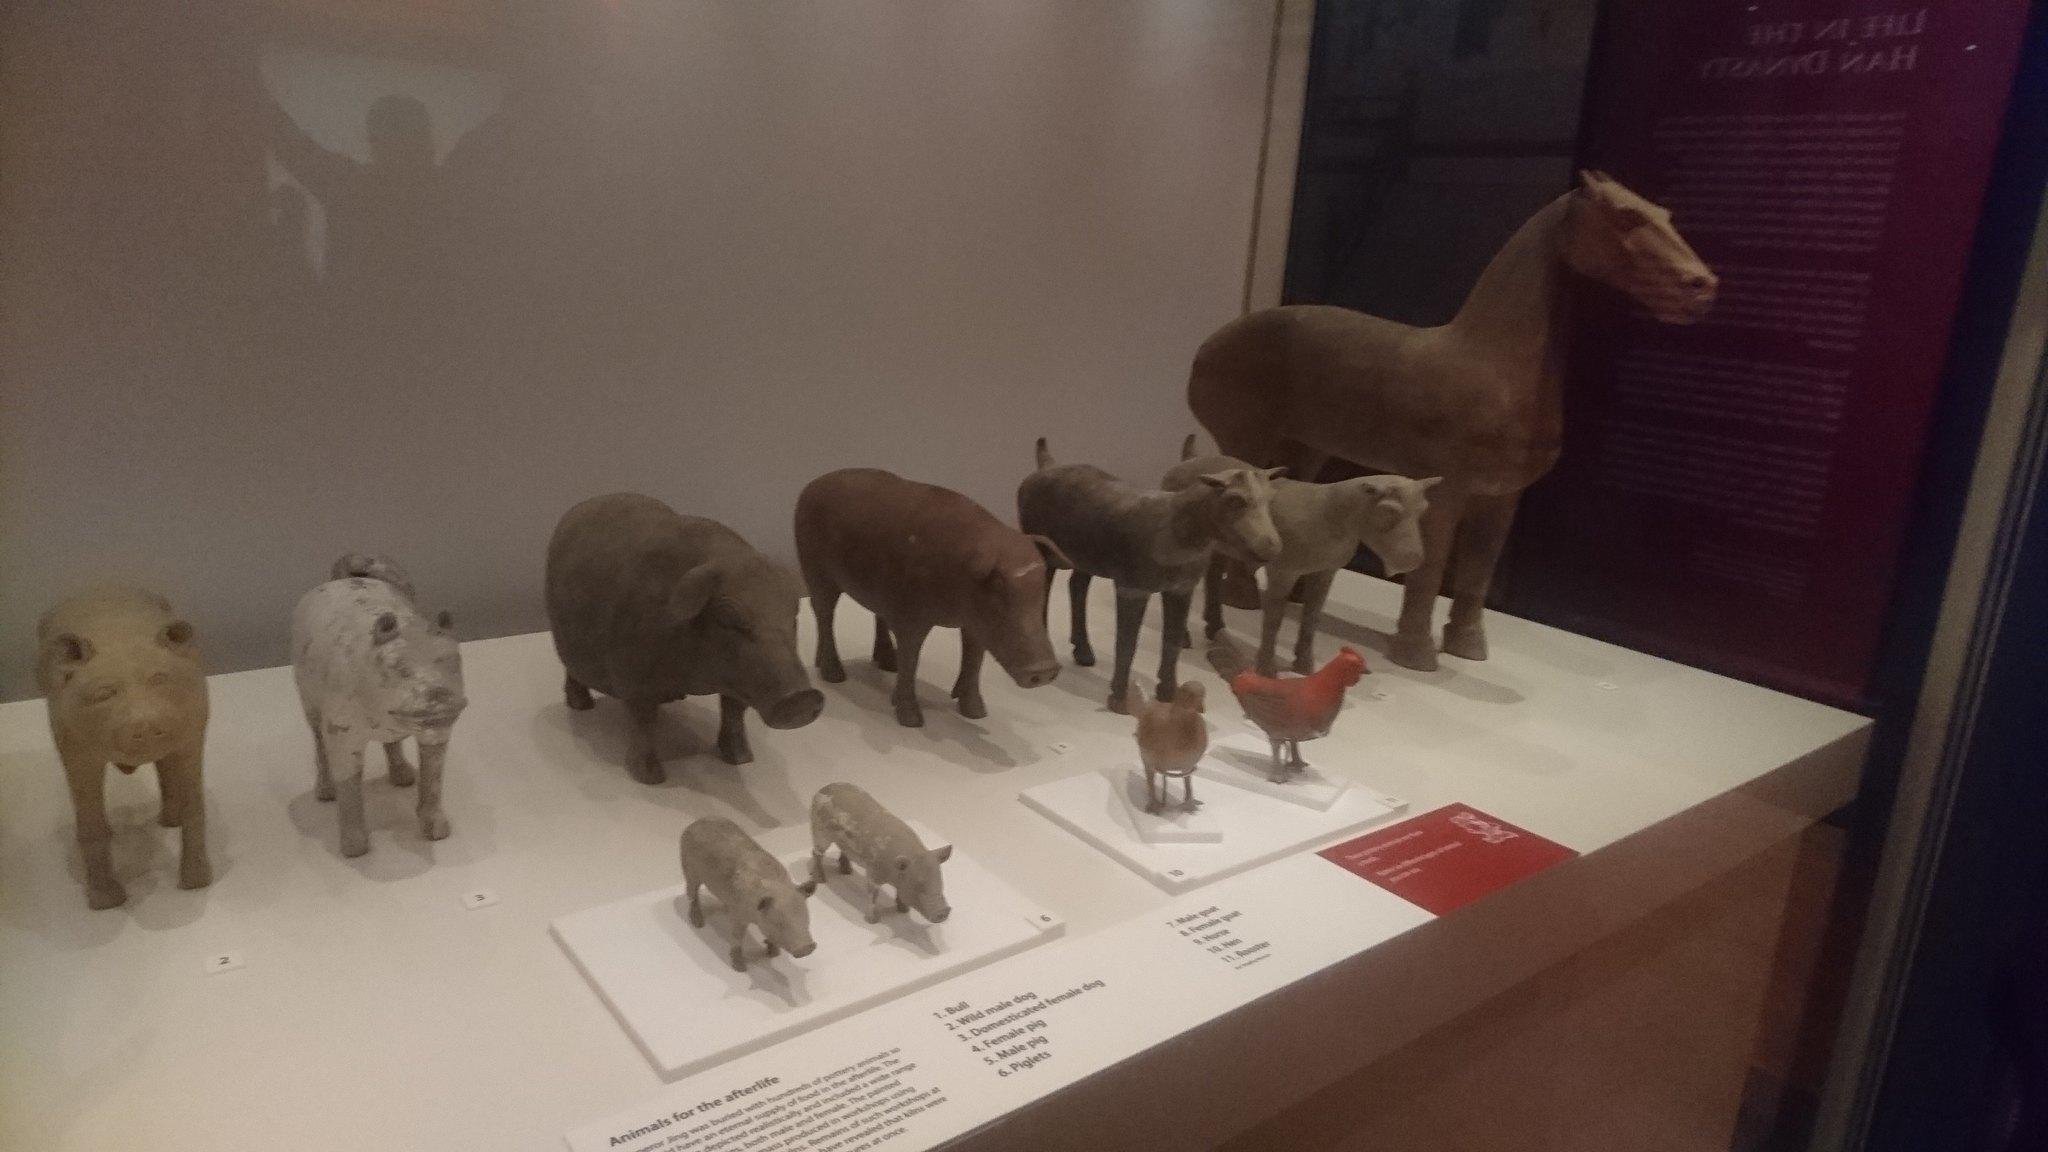 More terracotta animals